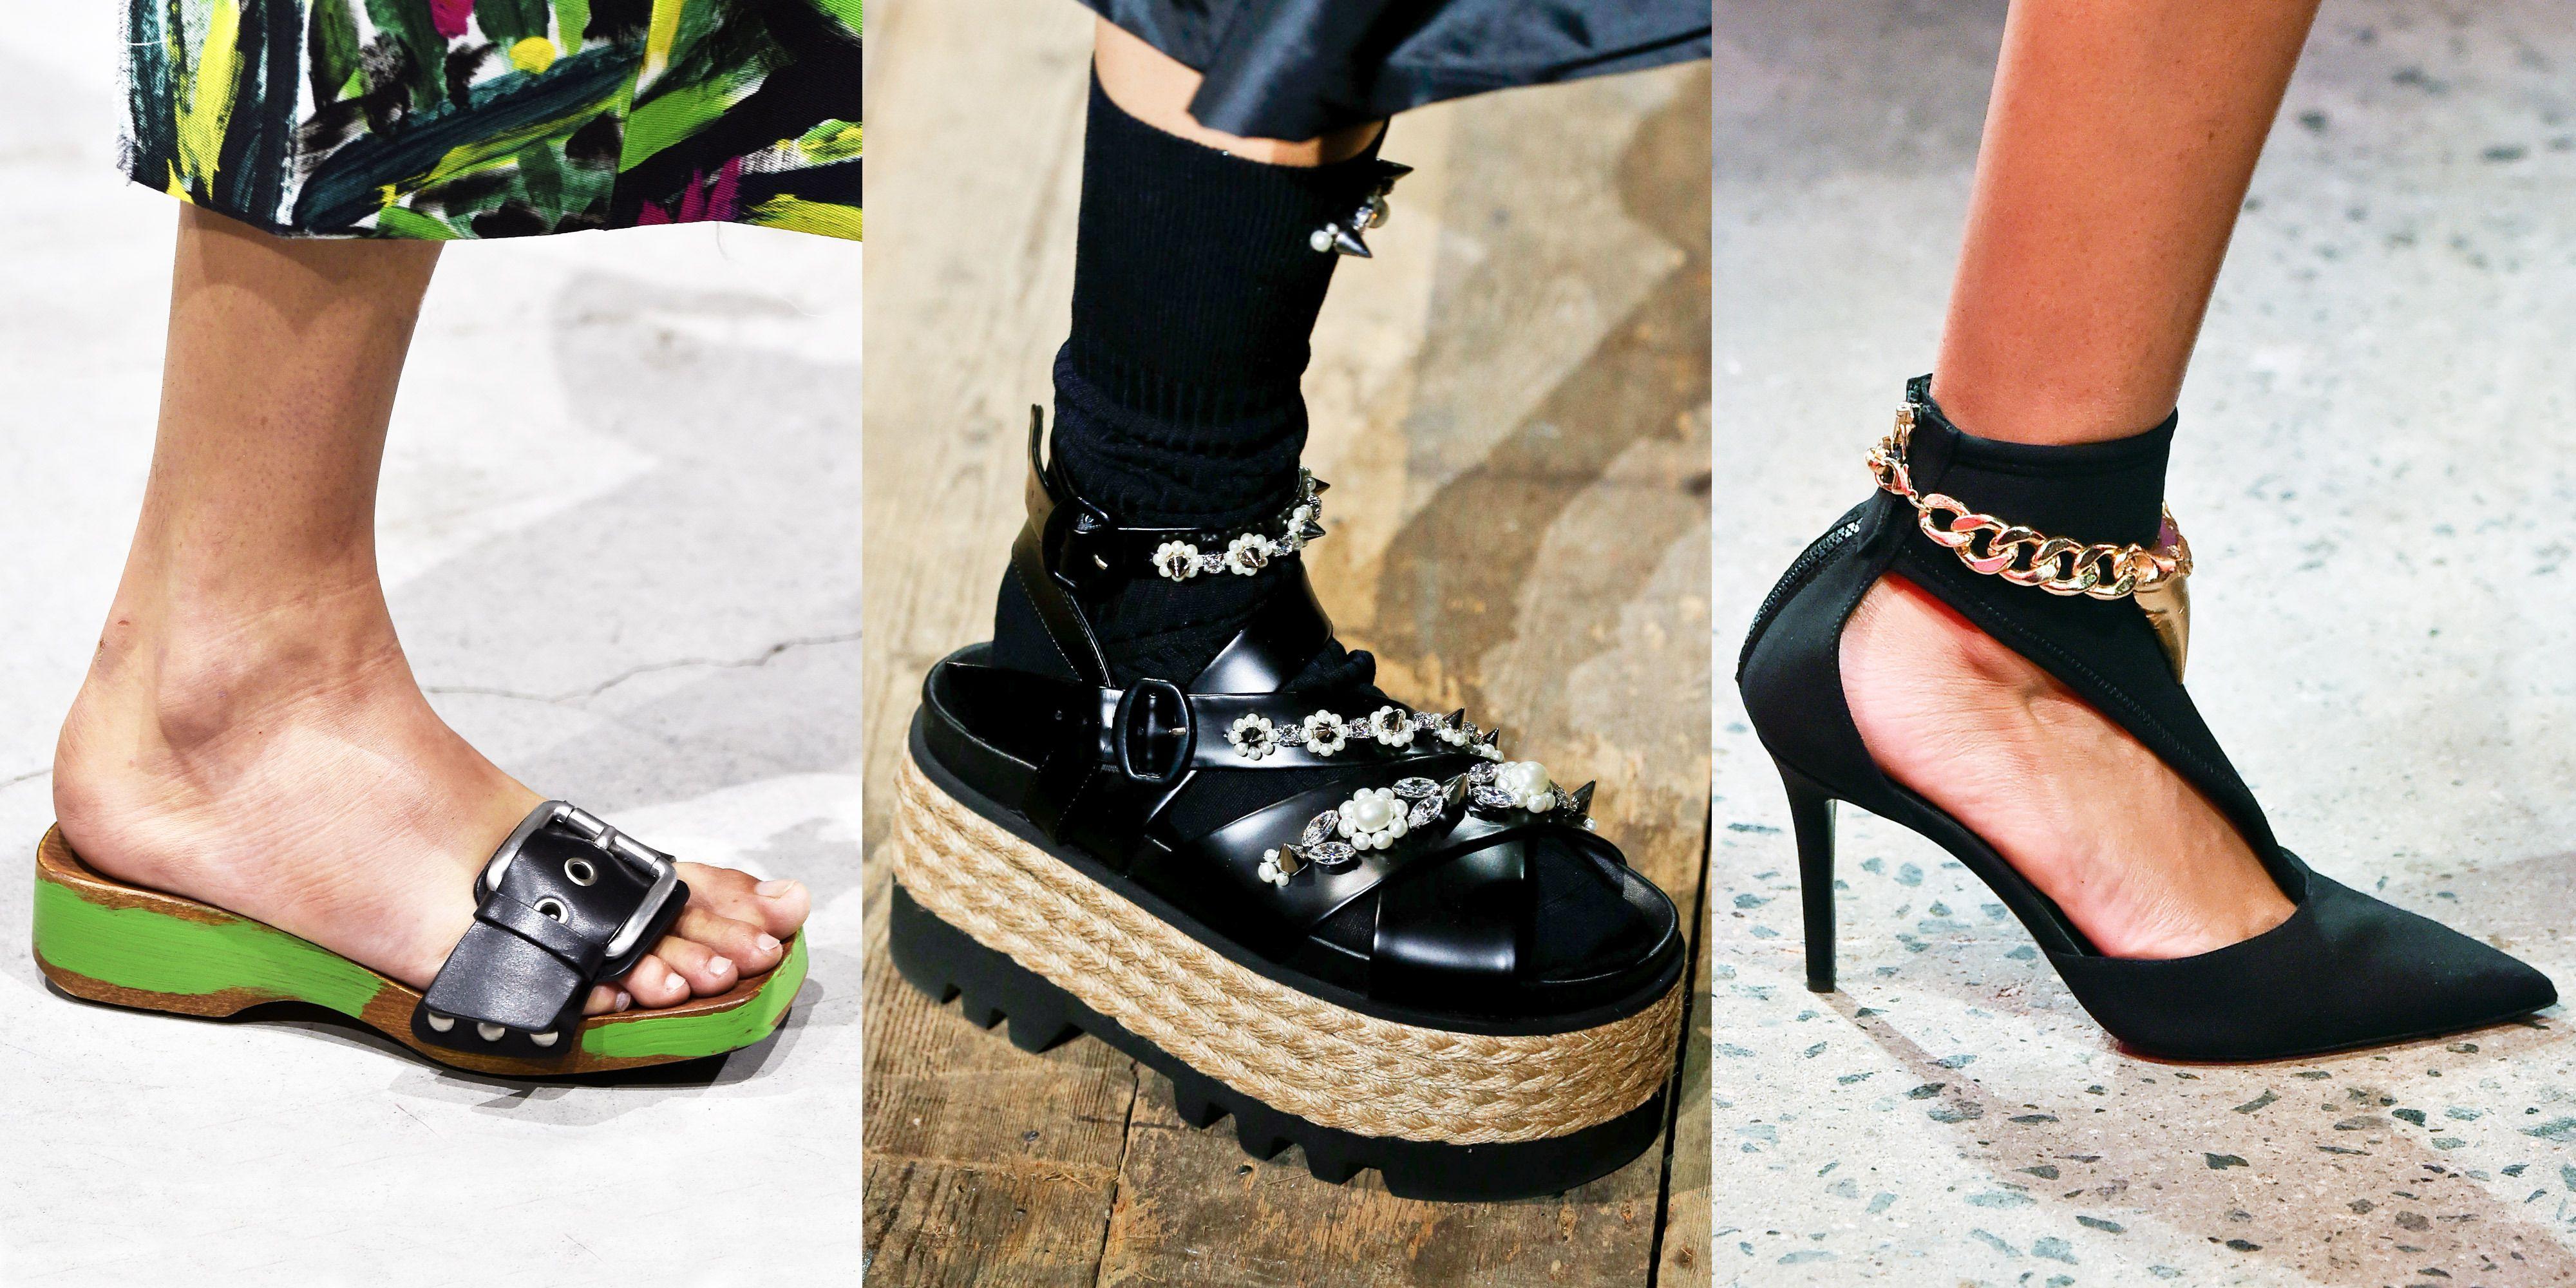 The 5 Biggest Shoe Trends of Summer 2020